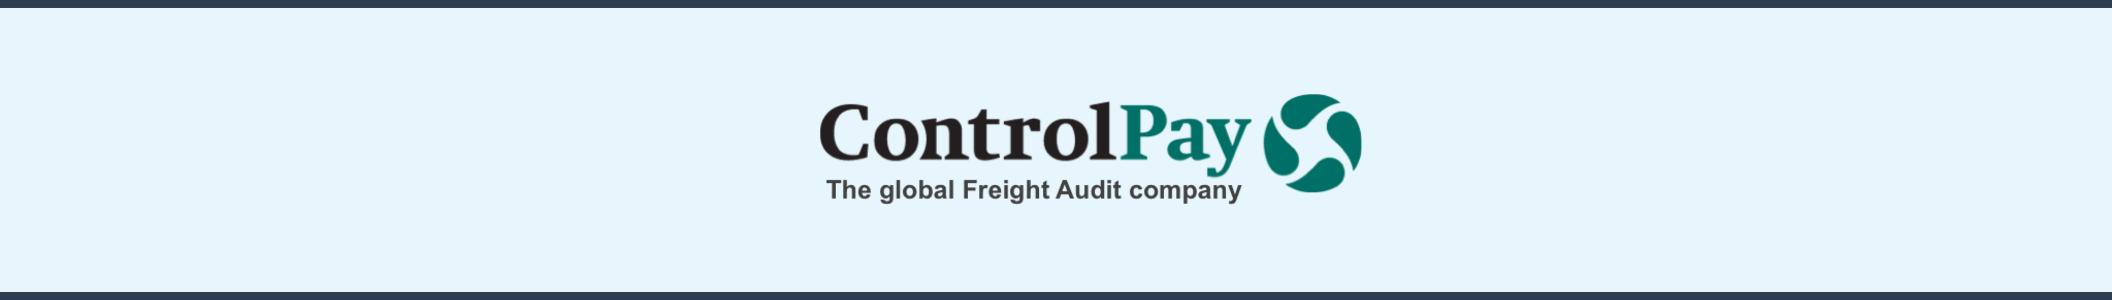 ControlPay.Freight Audit